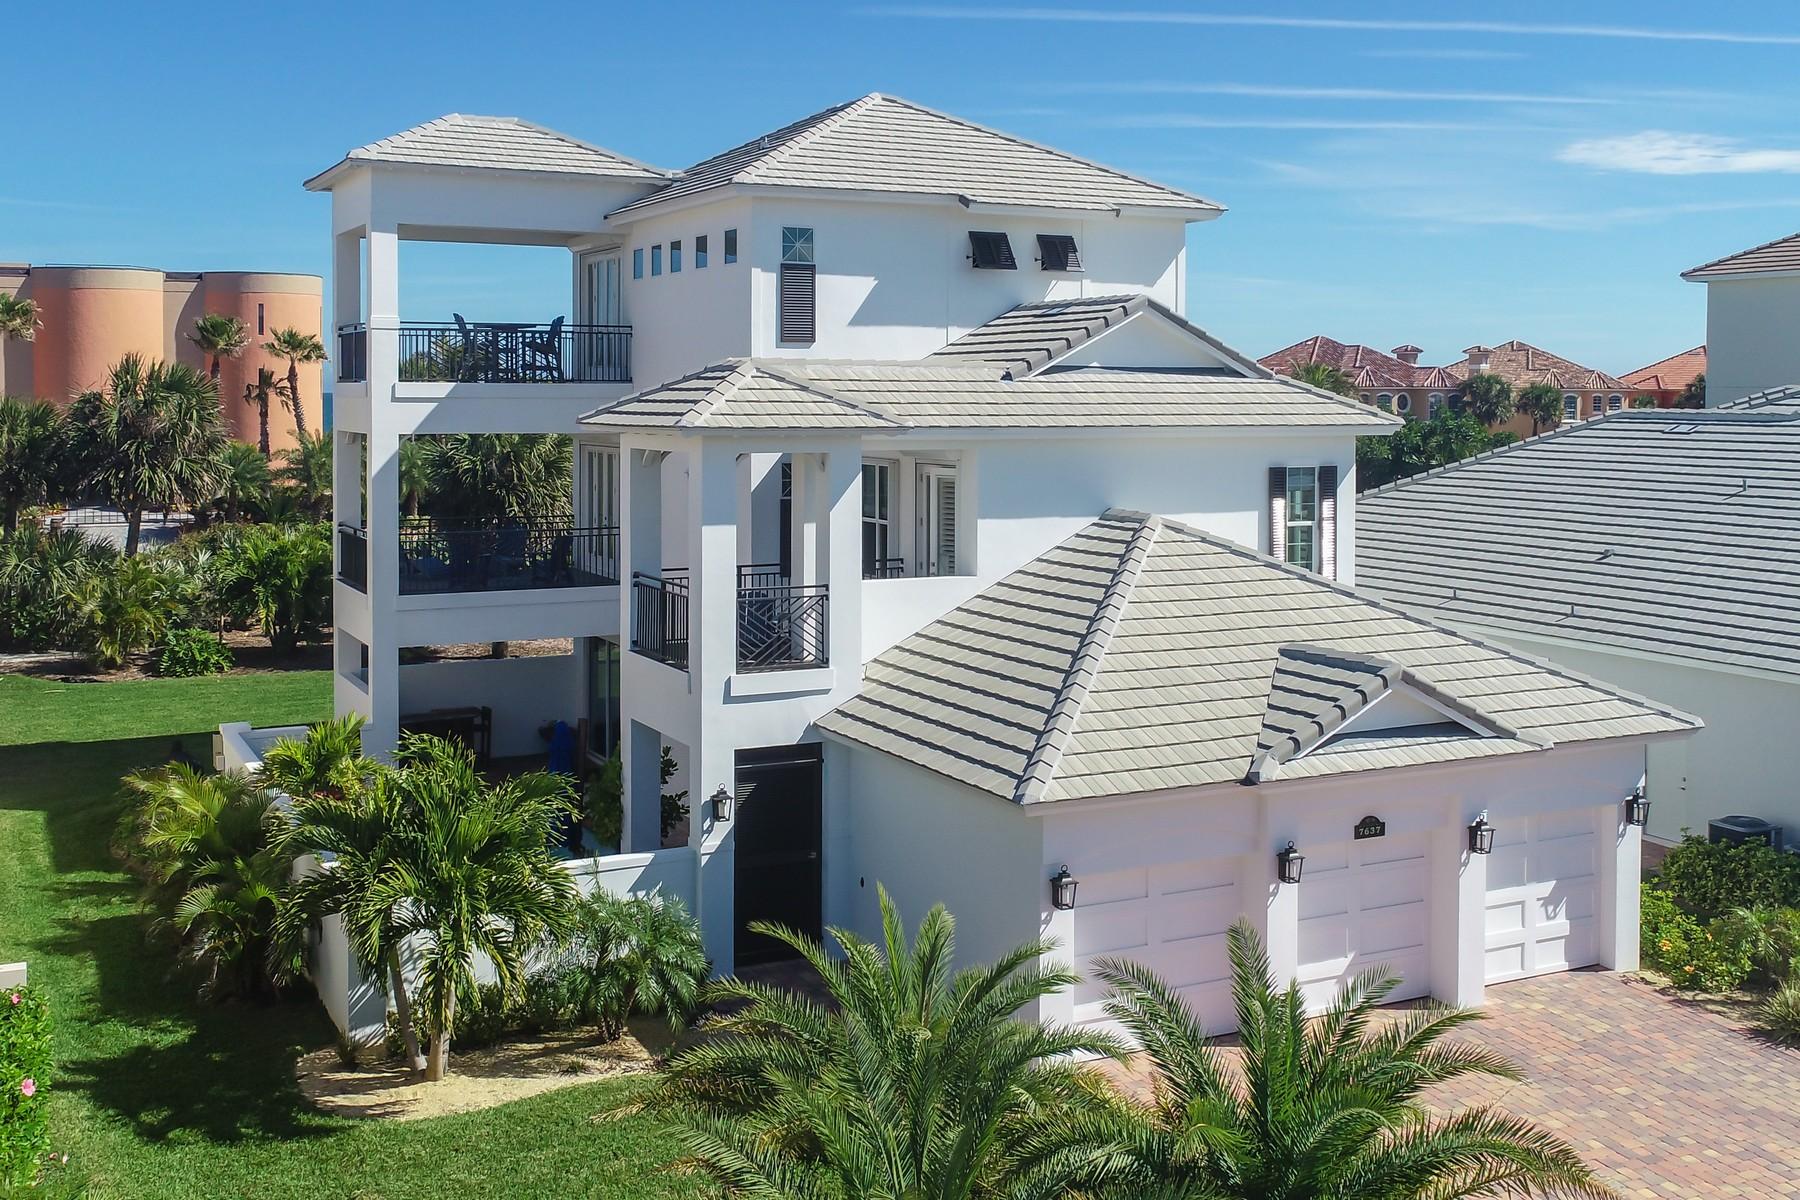 Property for Sale at Gorgeous Coastal Pool Home in Maritime Hammock at Aquarina. 7637 Kiawah Way Melbourne Beach, Florida 32951 United States